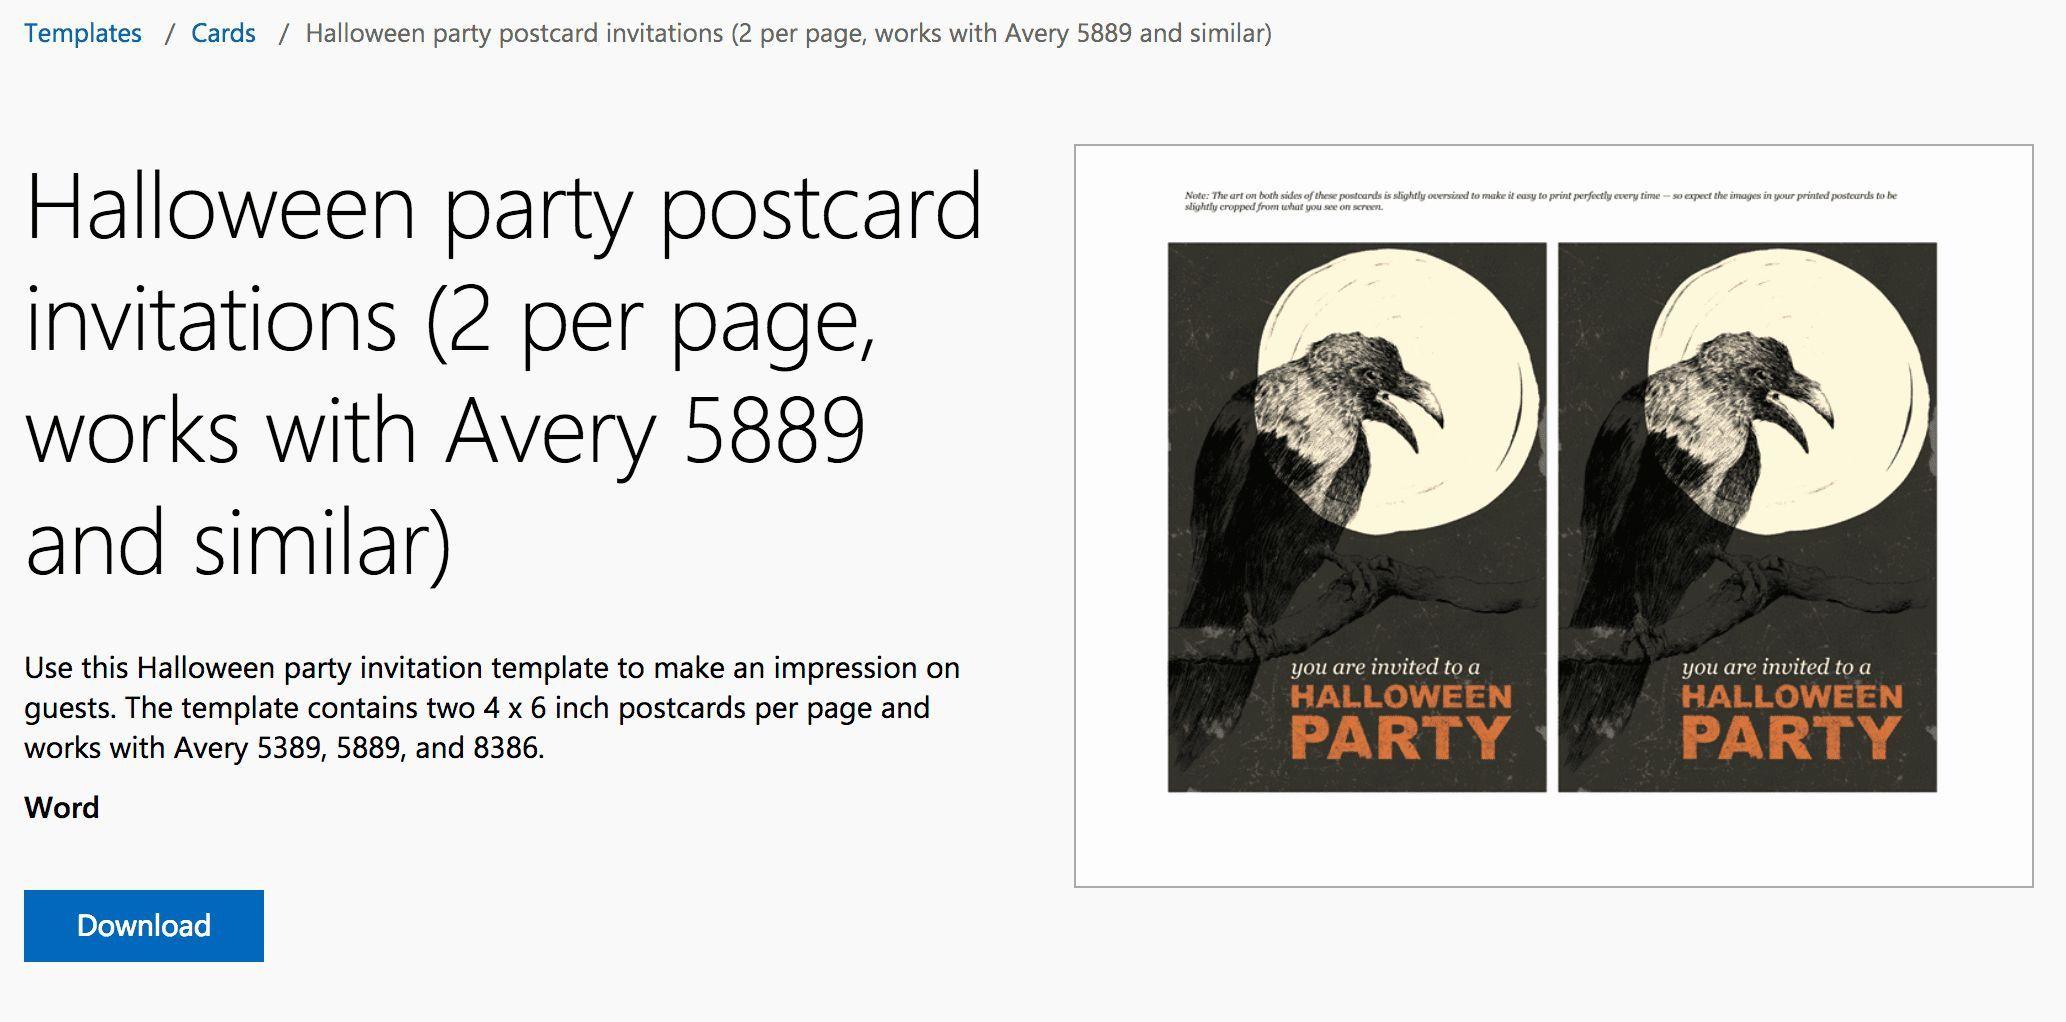 004 Fantastic Microsoft Word Invitation Template 2 Per Page Example Full